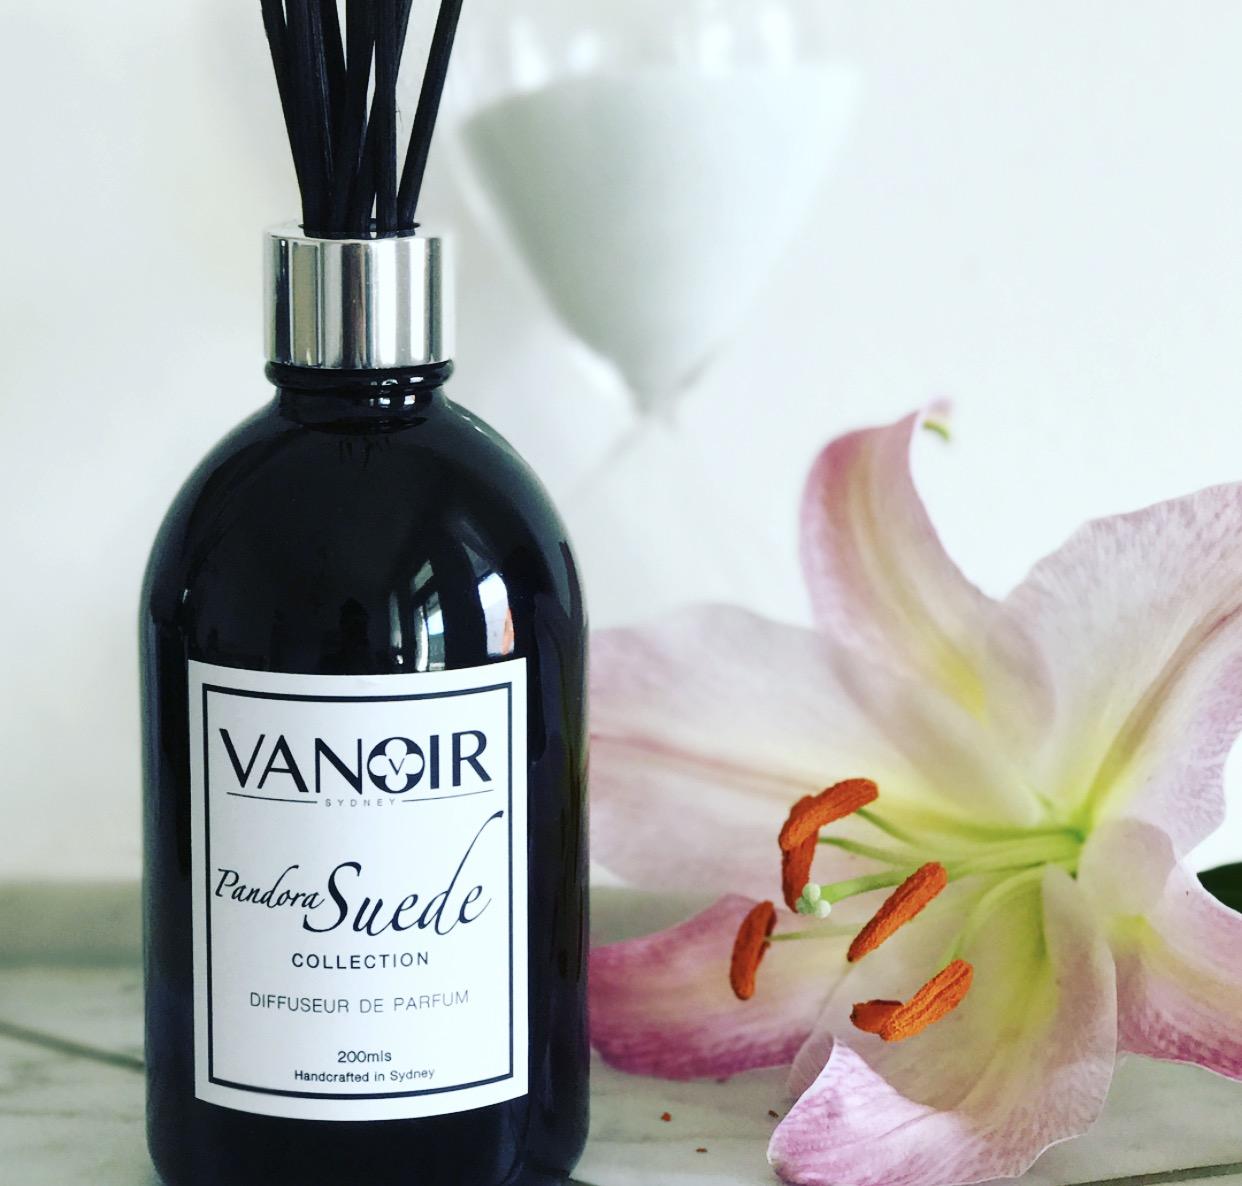 pandora suede diffuseur de parfum collection vanoir. Black Bedroom Furniture Sets. Home Design Ideas